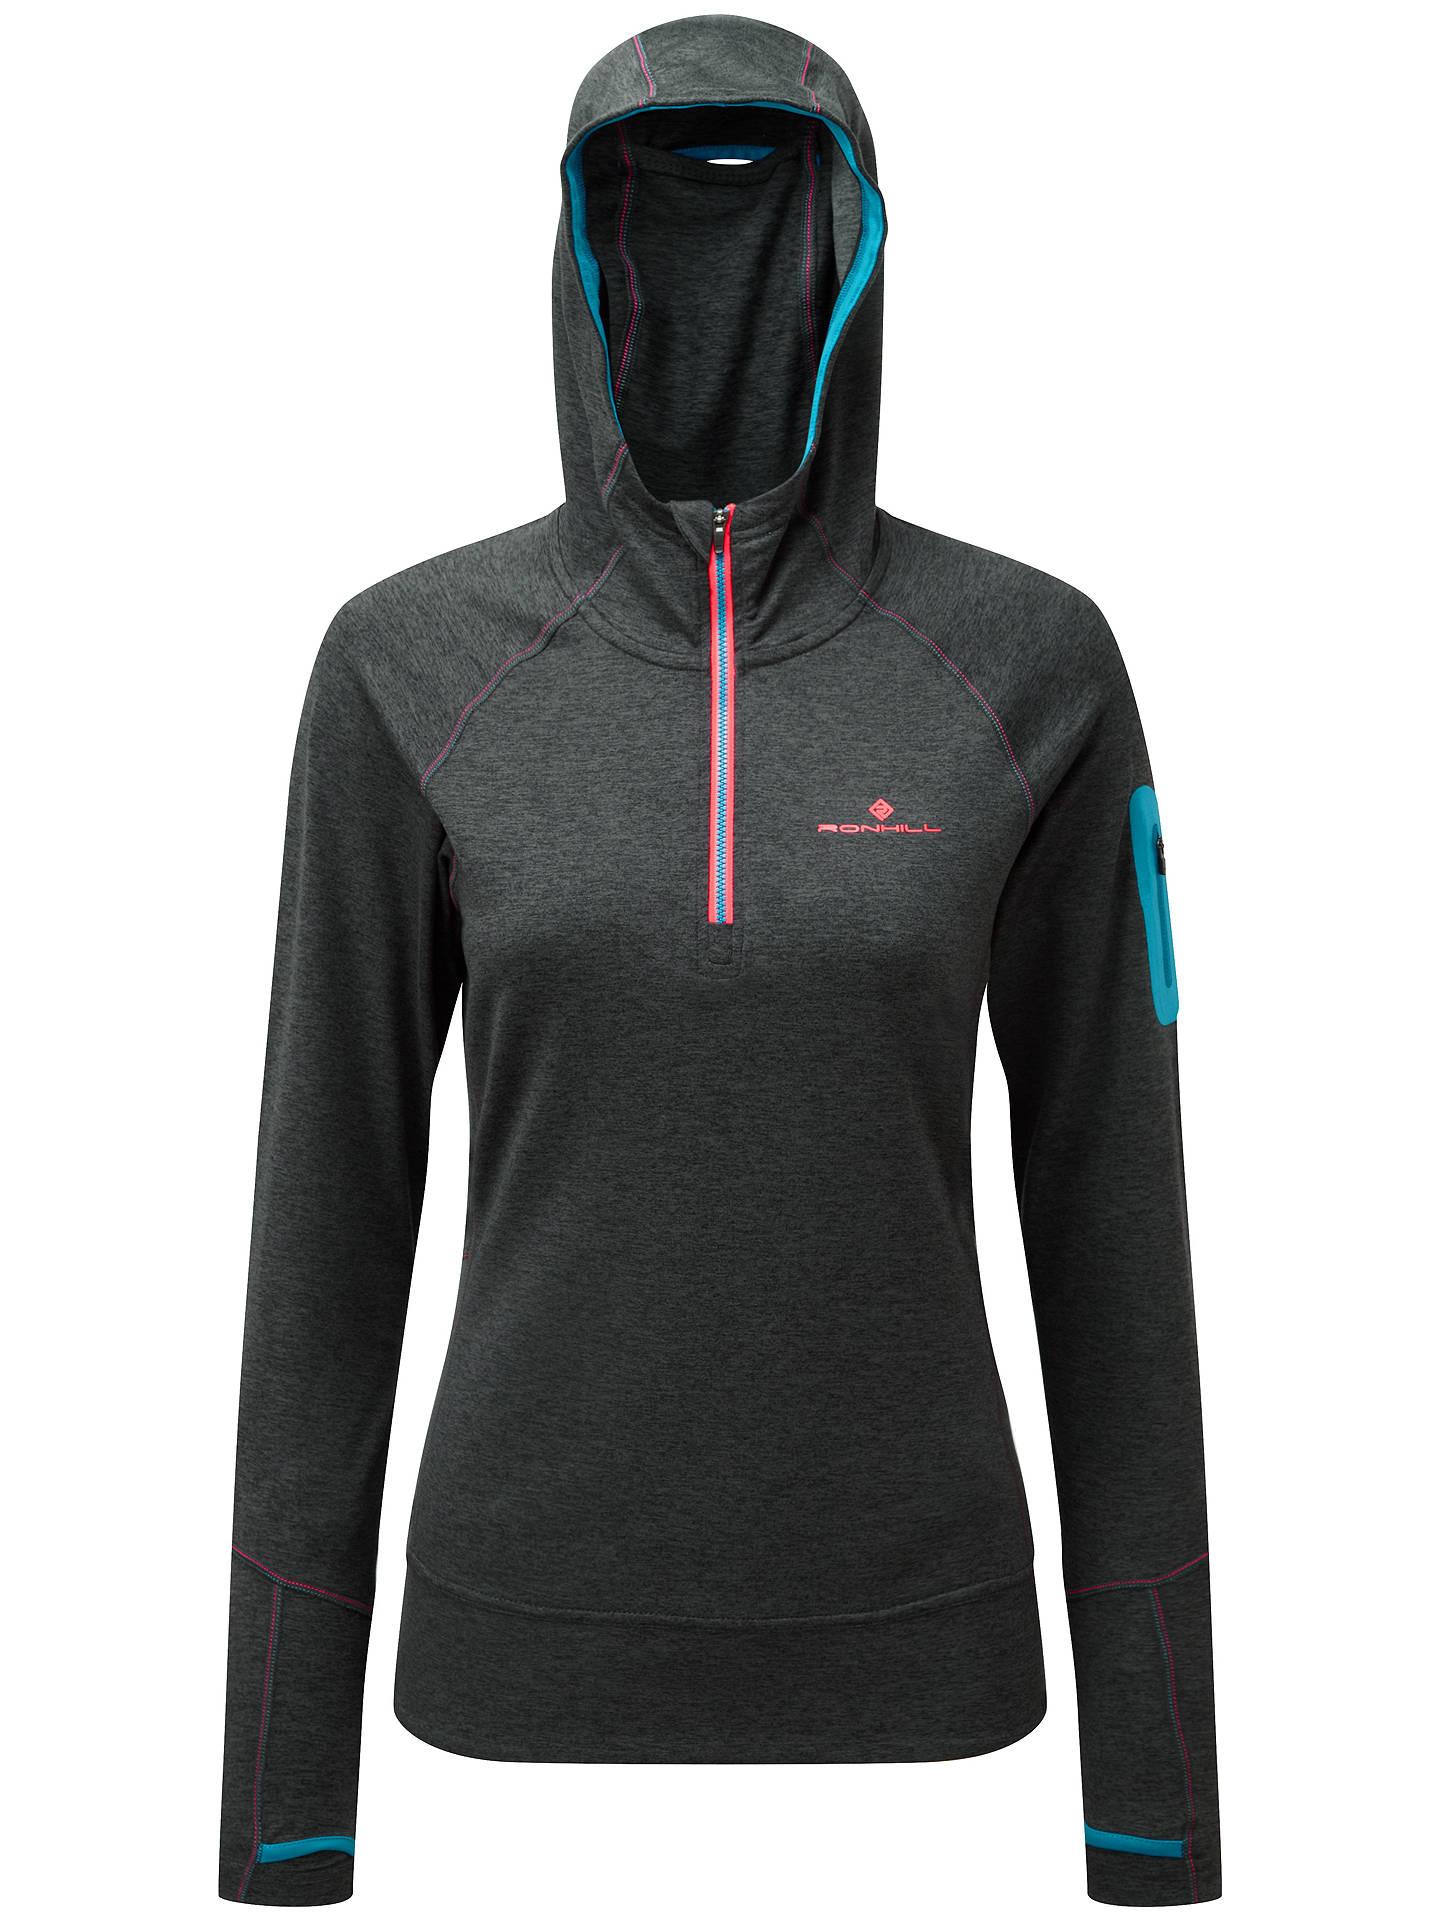 Damen-Sportbekleidung Fitness & Laufbekleidung Ron Hill Victory Running Hoody Womens Grey/Blue Jogging Hoodie Shirt Fitness